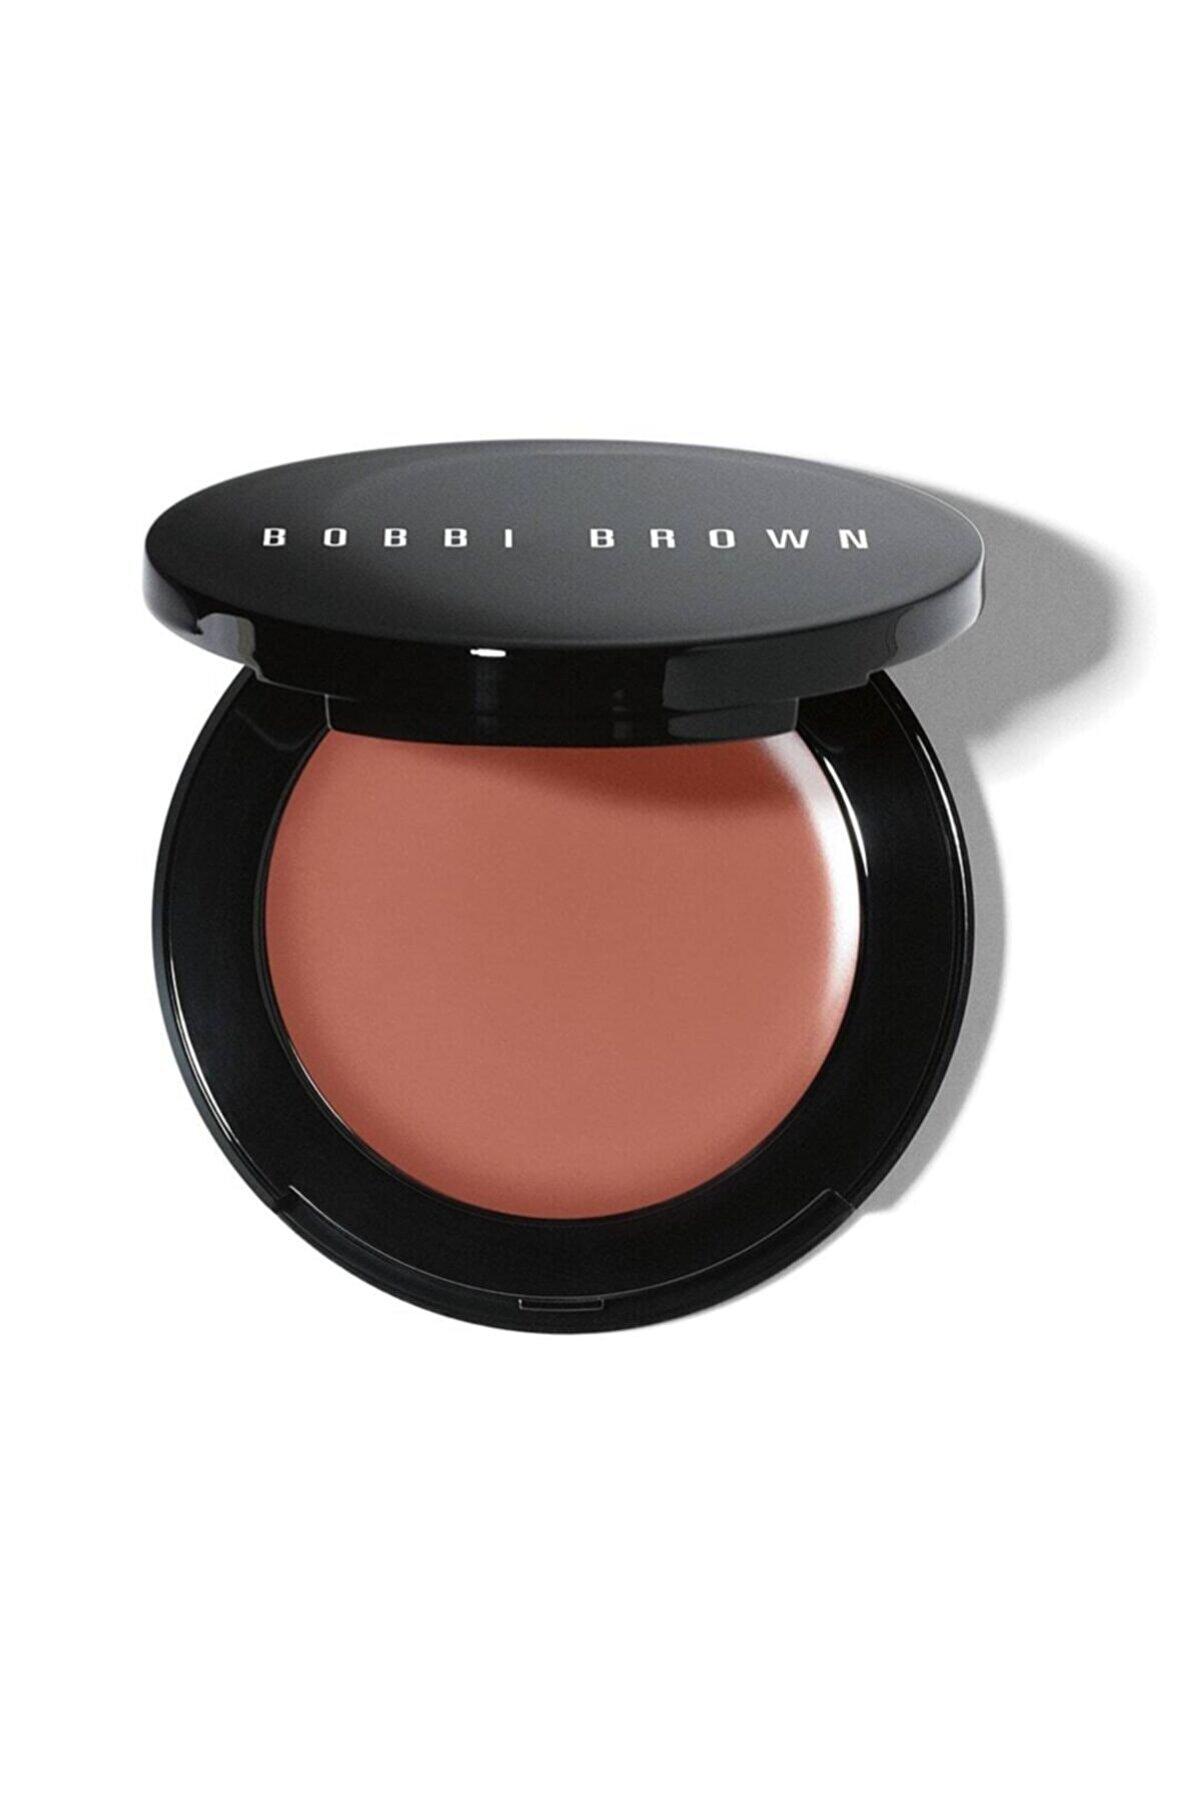 Bobbi Brown Pot Rouge For Lips & Cheeks / Ruj & Allık 3.8 ml Powder Pink 716170096971